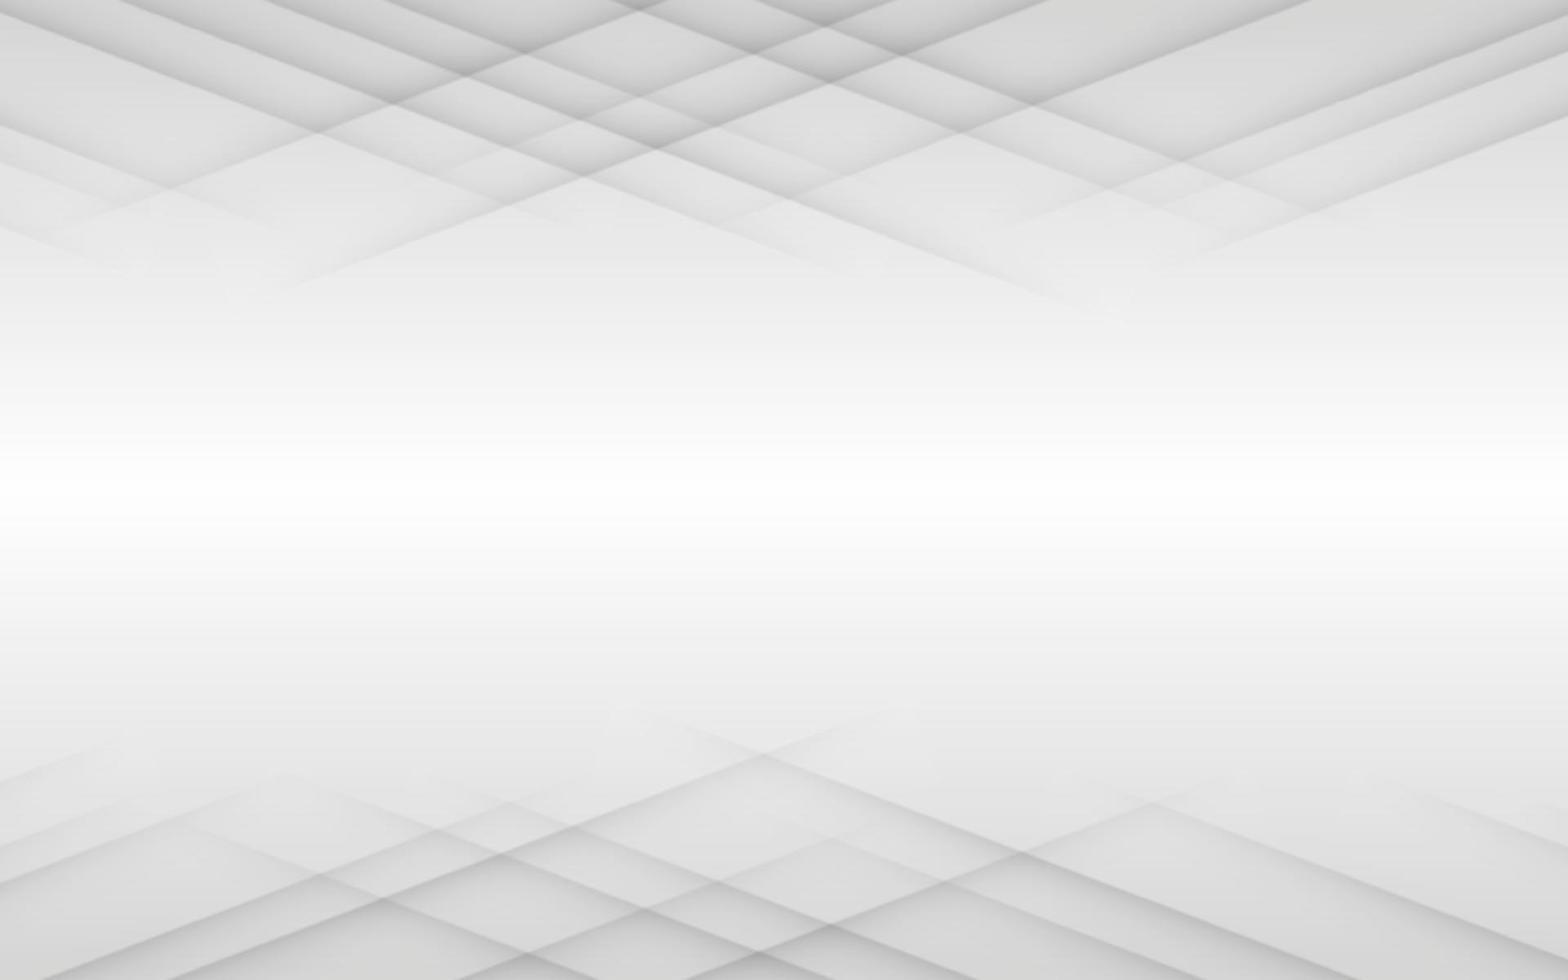 abstrakter heller silberner Hintergrund vektor